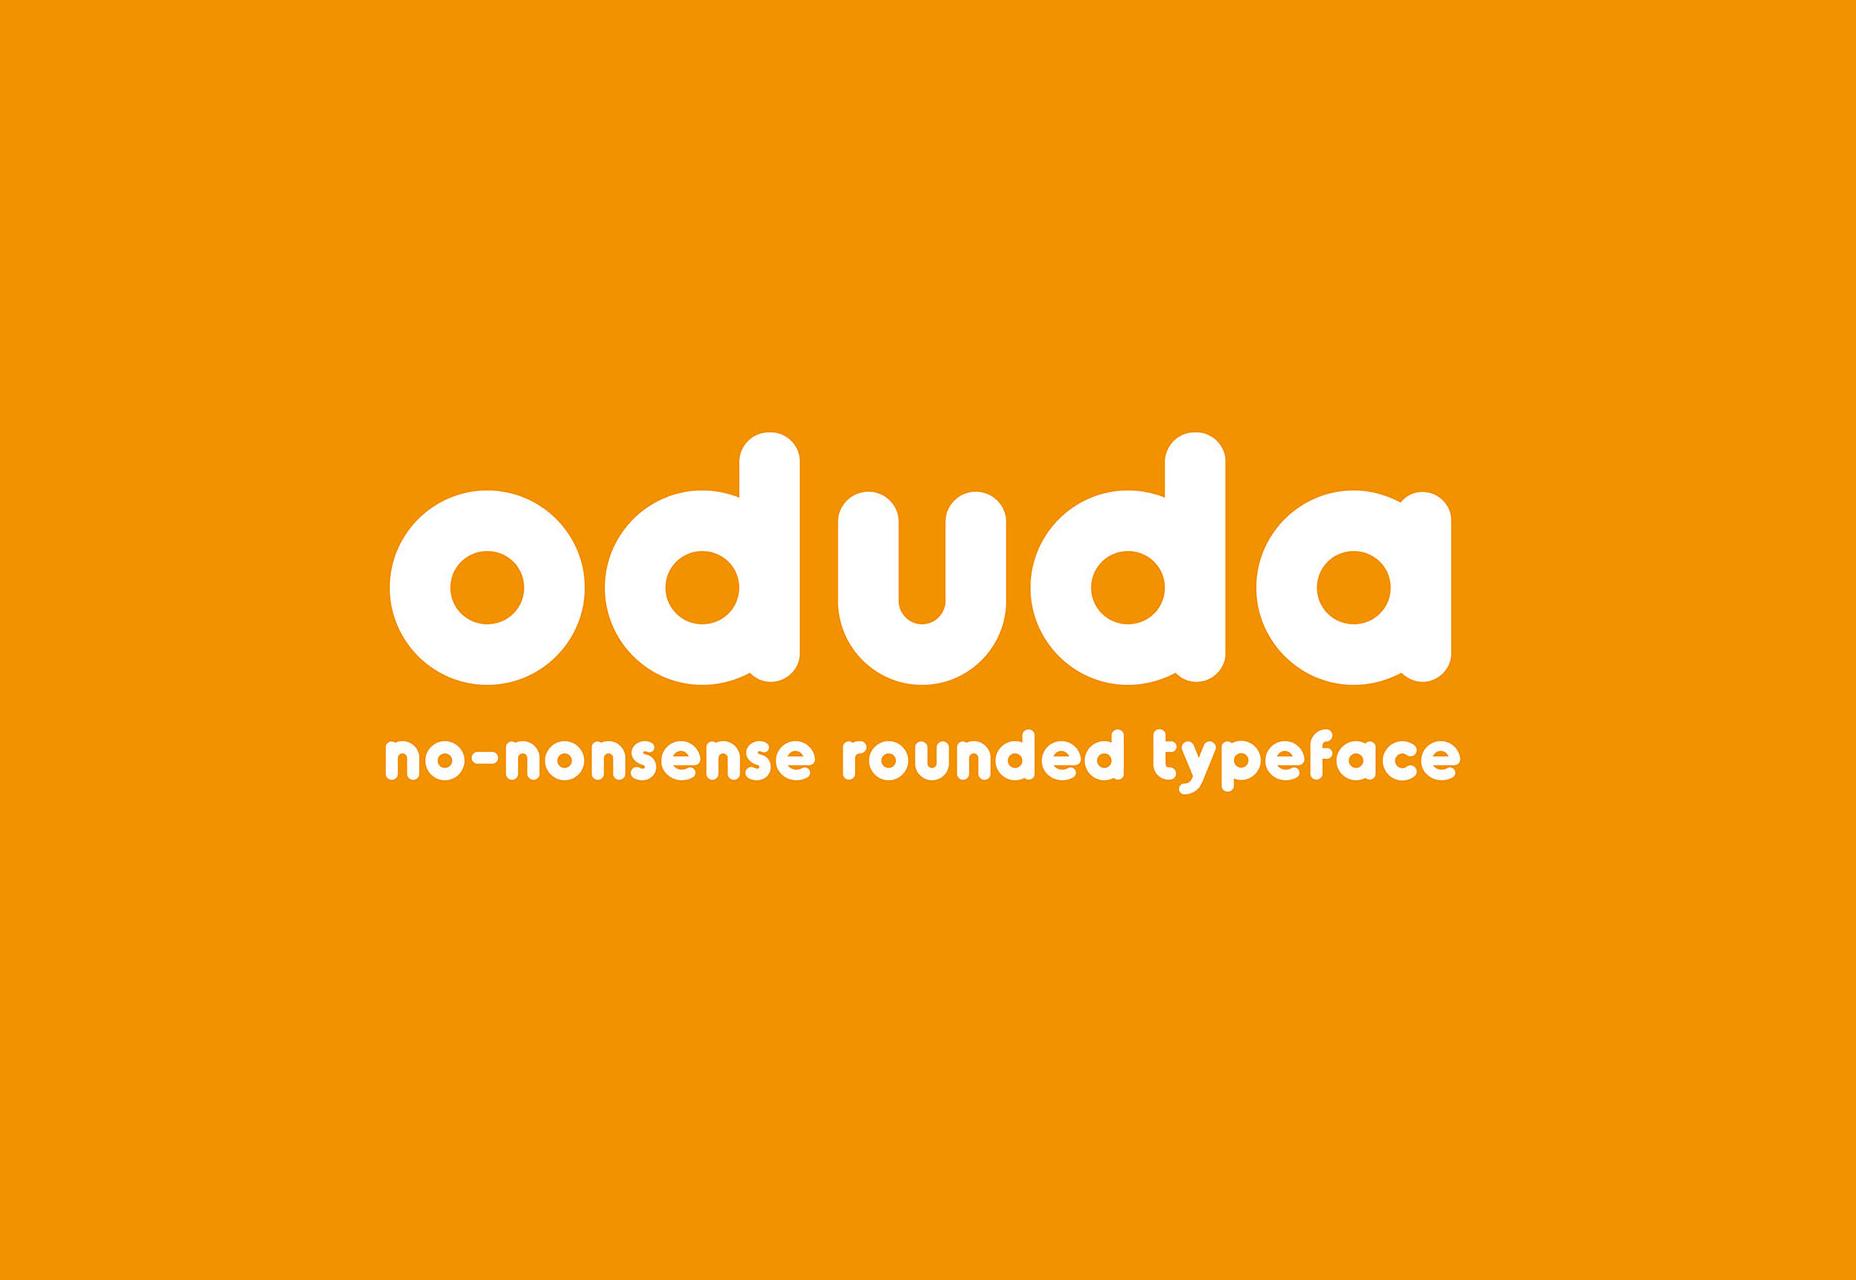 Oduda: tipografía en negrita redondeada